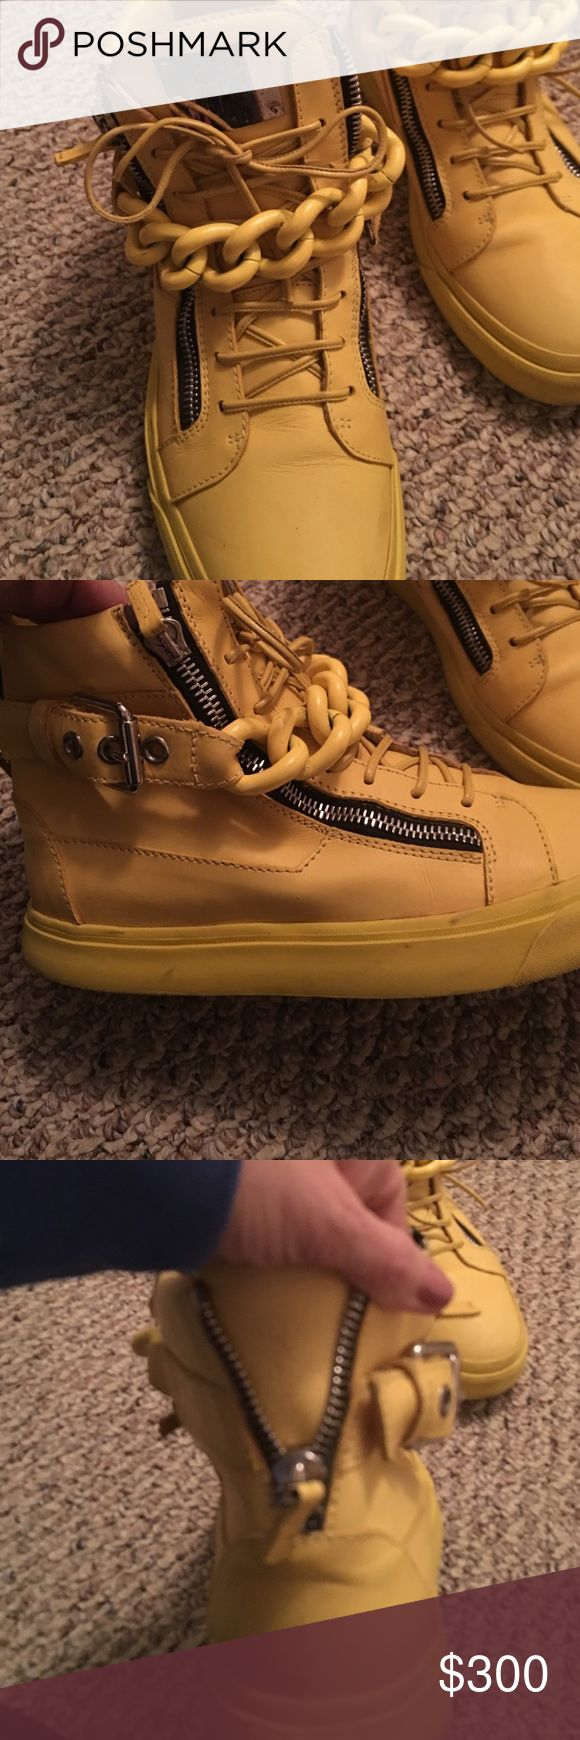 Men's Guiseppe Zanotti Yellow Sneakers sz 43 Giuseppe Zanotti Shoes Sneakers